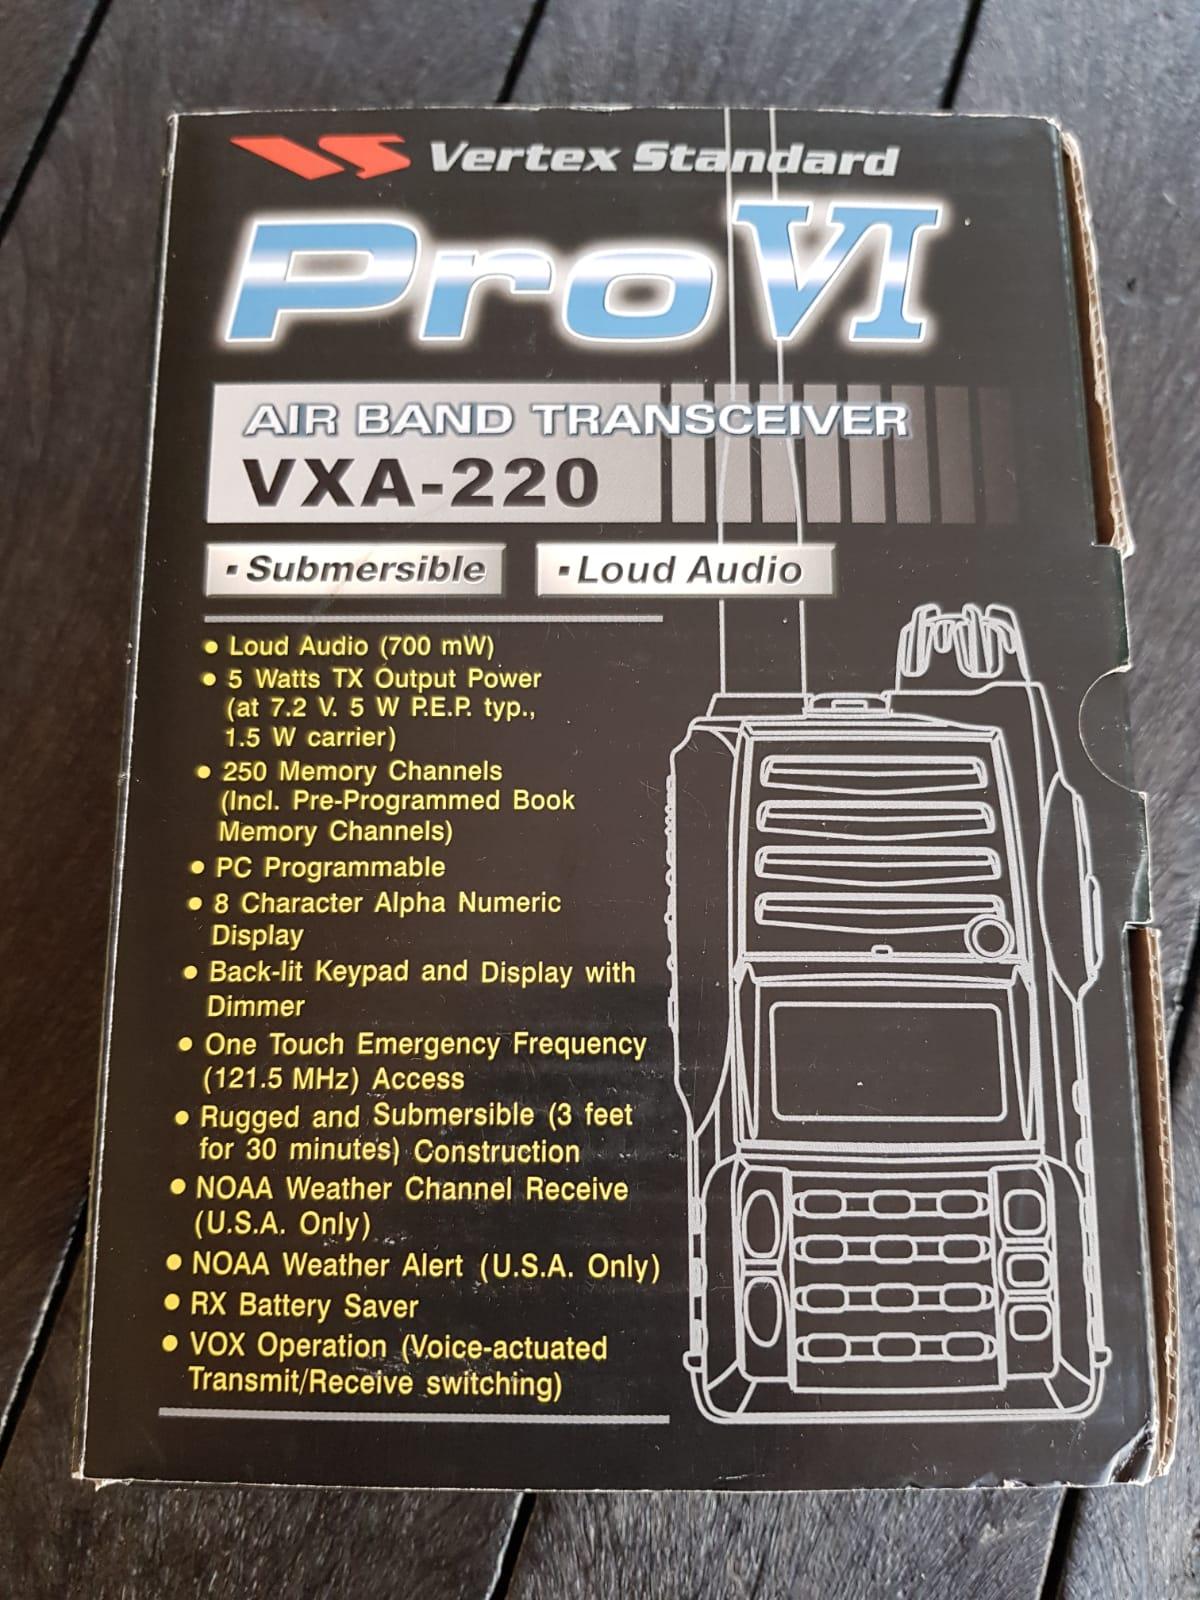 Pro VI - Air band transceiver VXA - 220